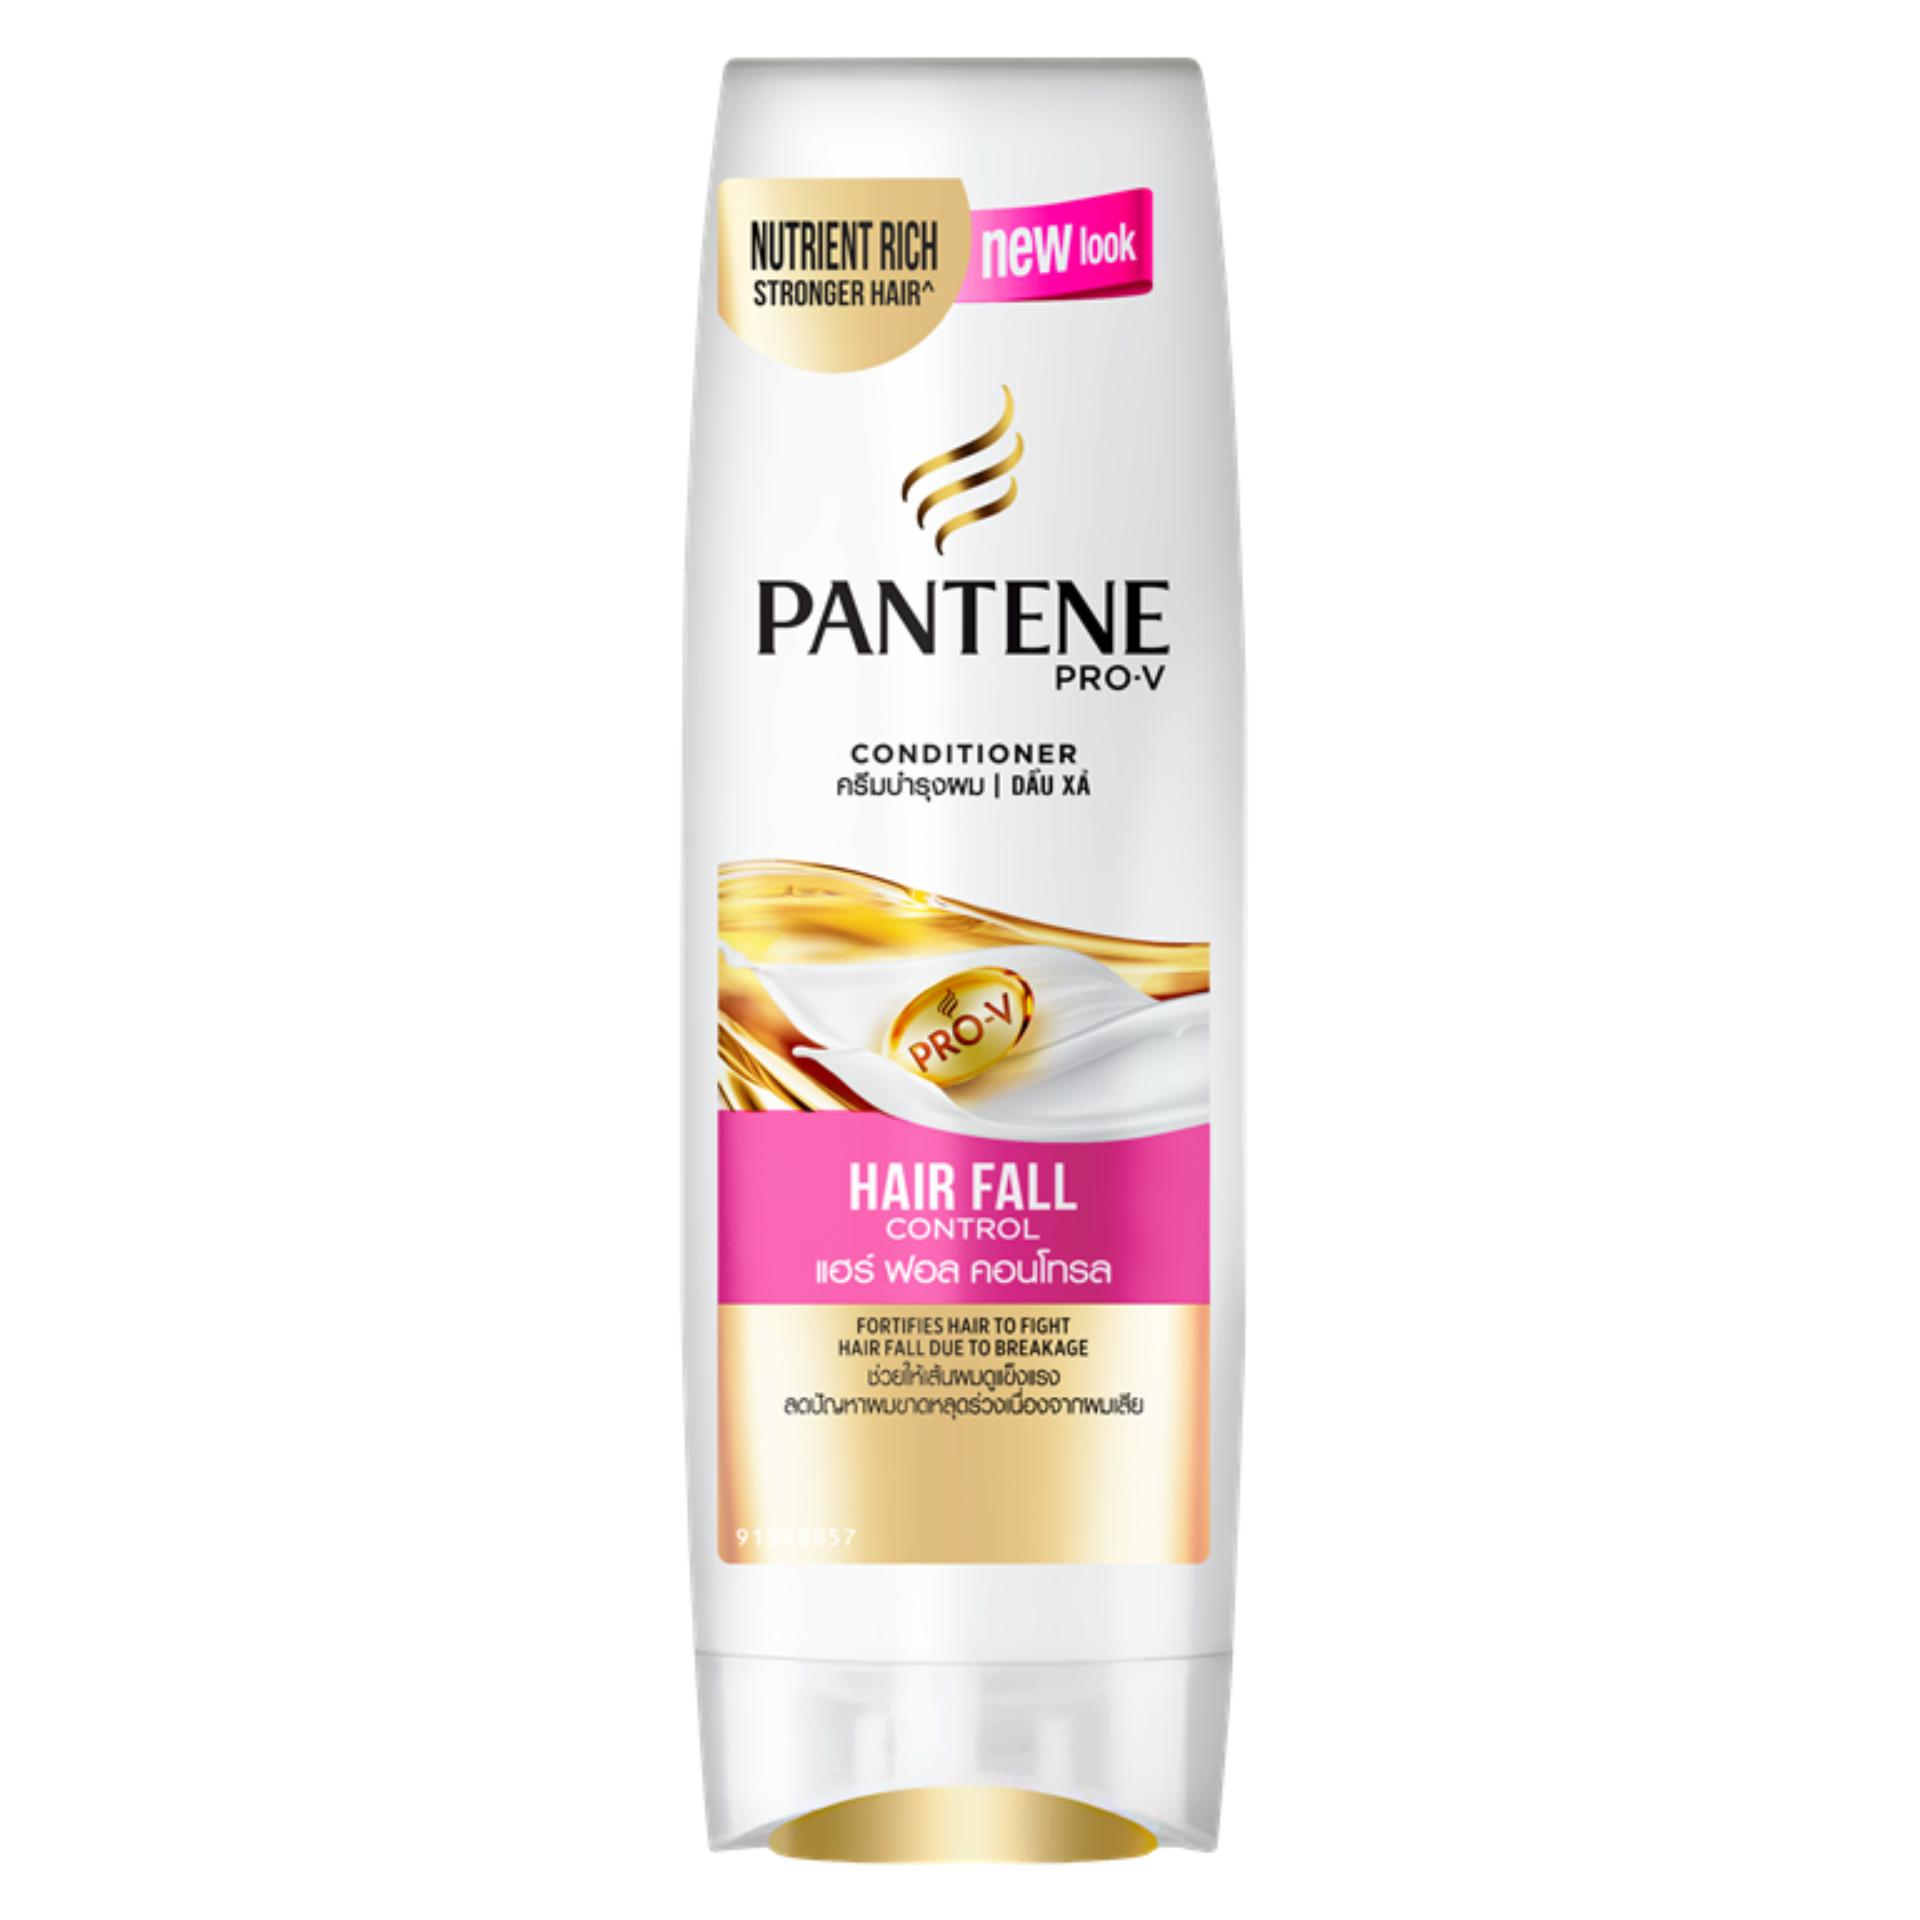 ... Pantene Hair Fall Control Conditioner 300ml